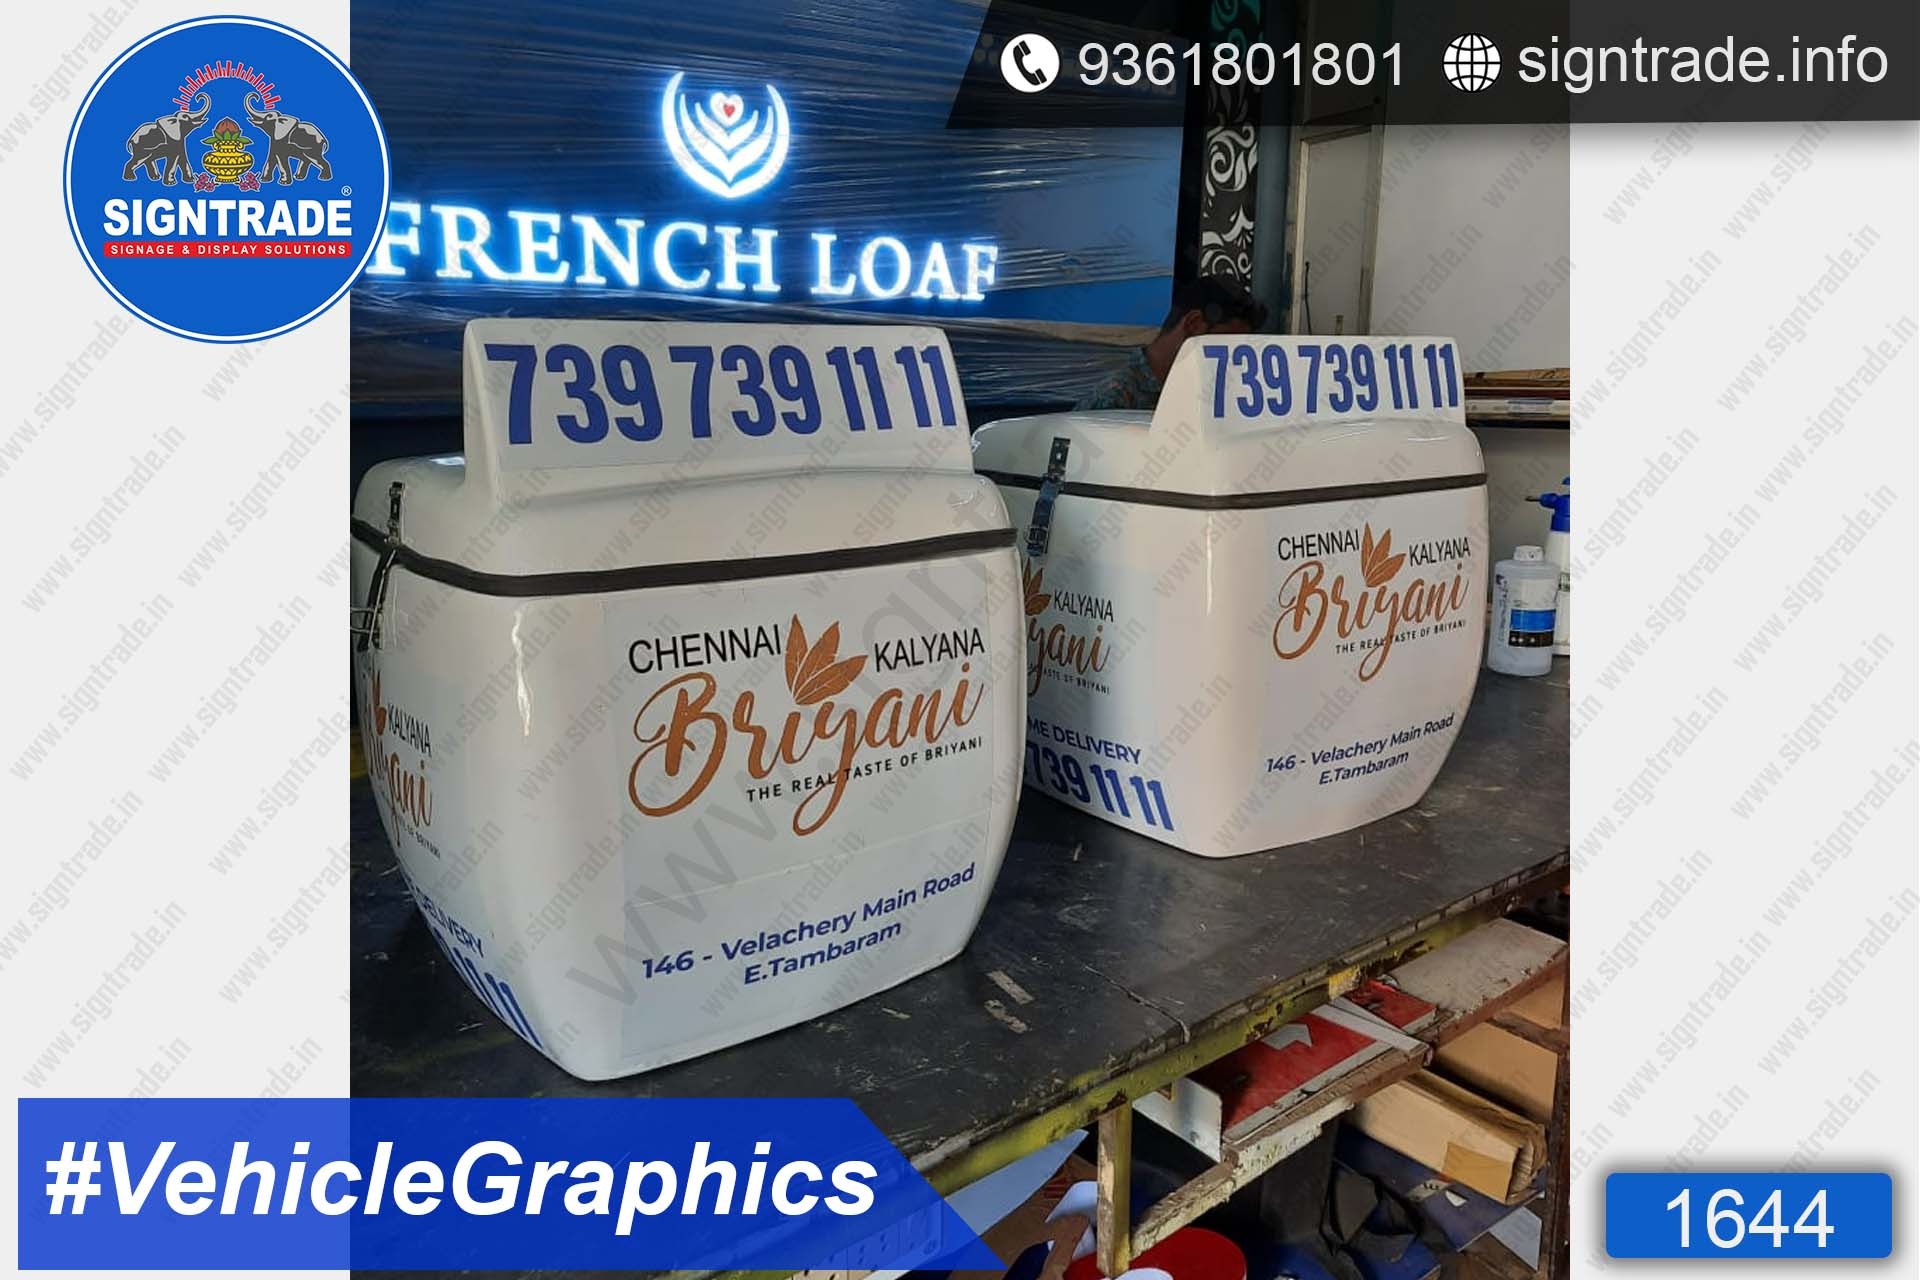 Chennai Kalyana Briyani, Chennai - SIGNTRADE - Vinyl Printing, Bike Graphics Service in Chennai